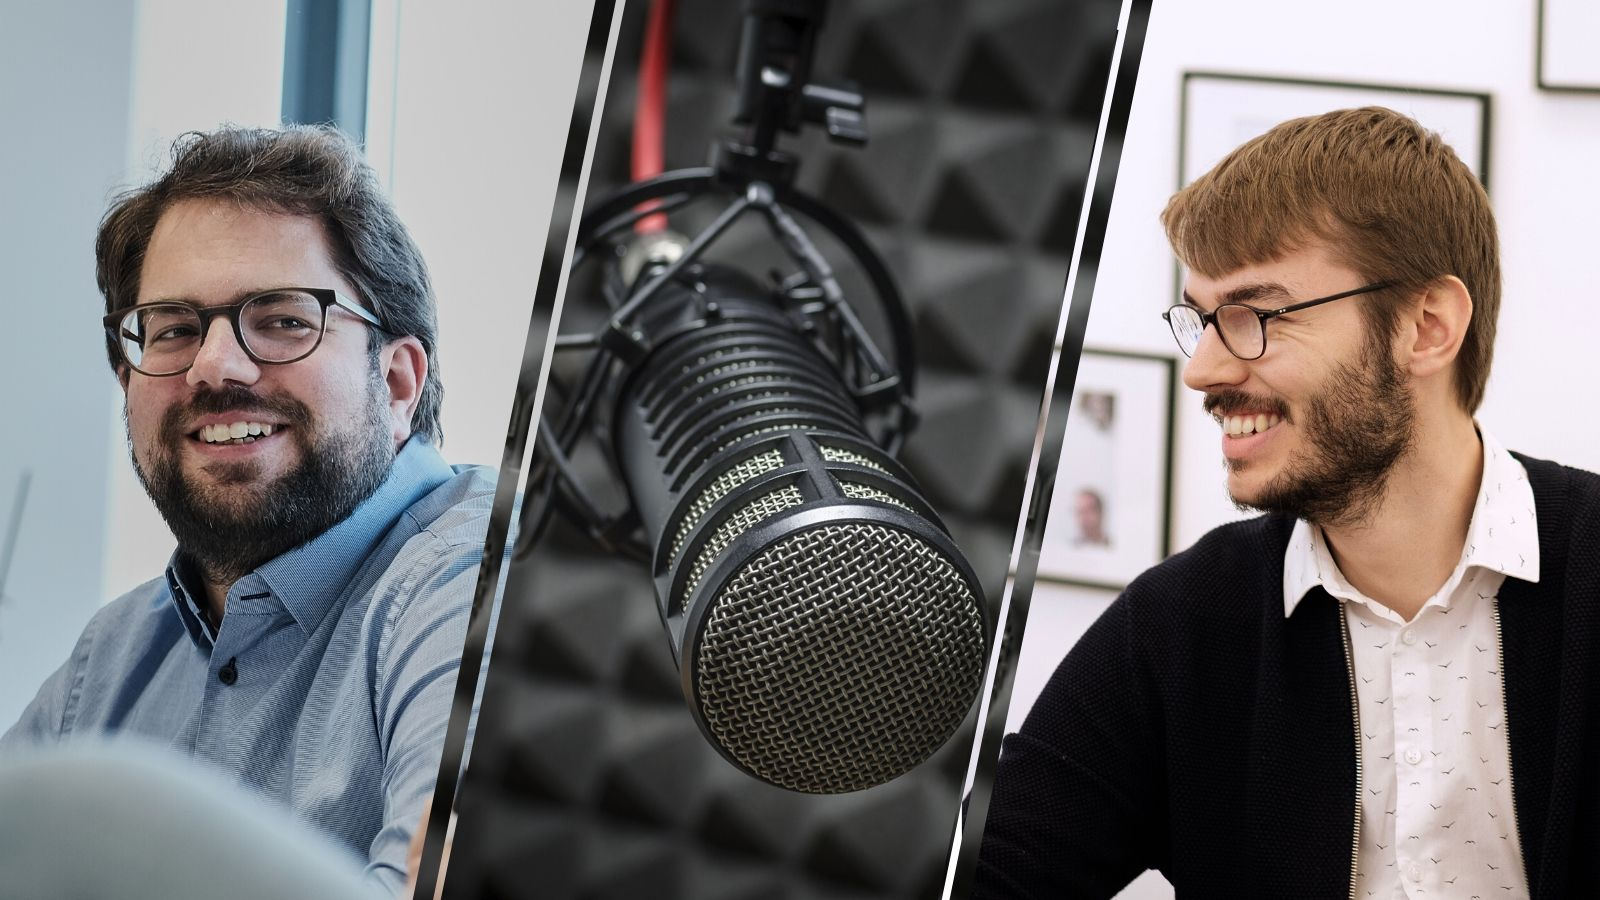 Podcast: Das Transparenzproblem des Parlaments - REPORTER